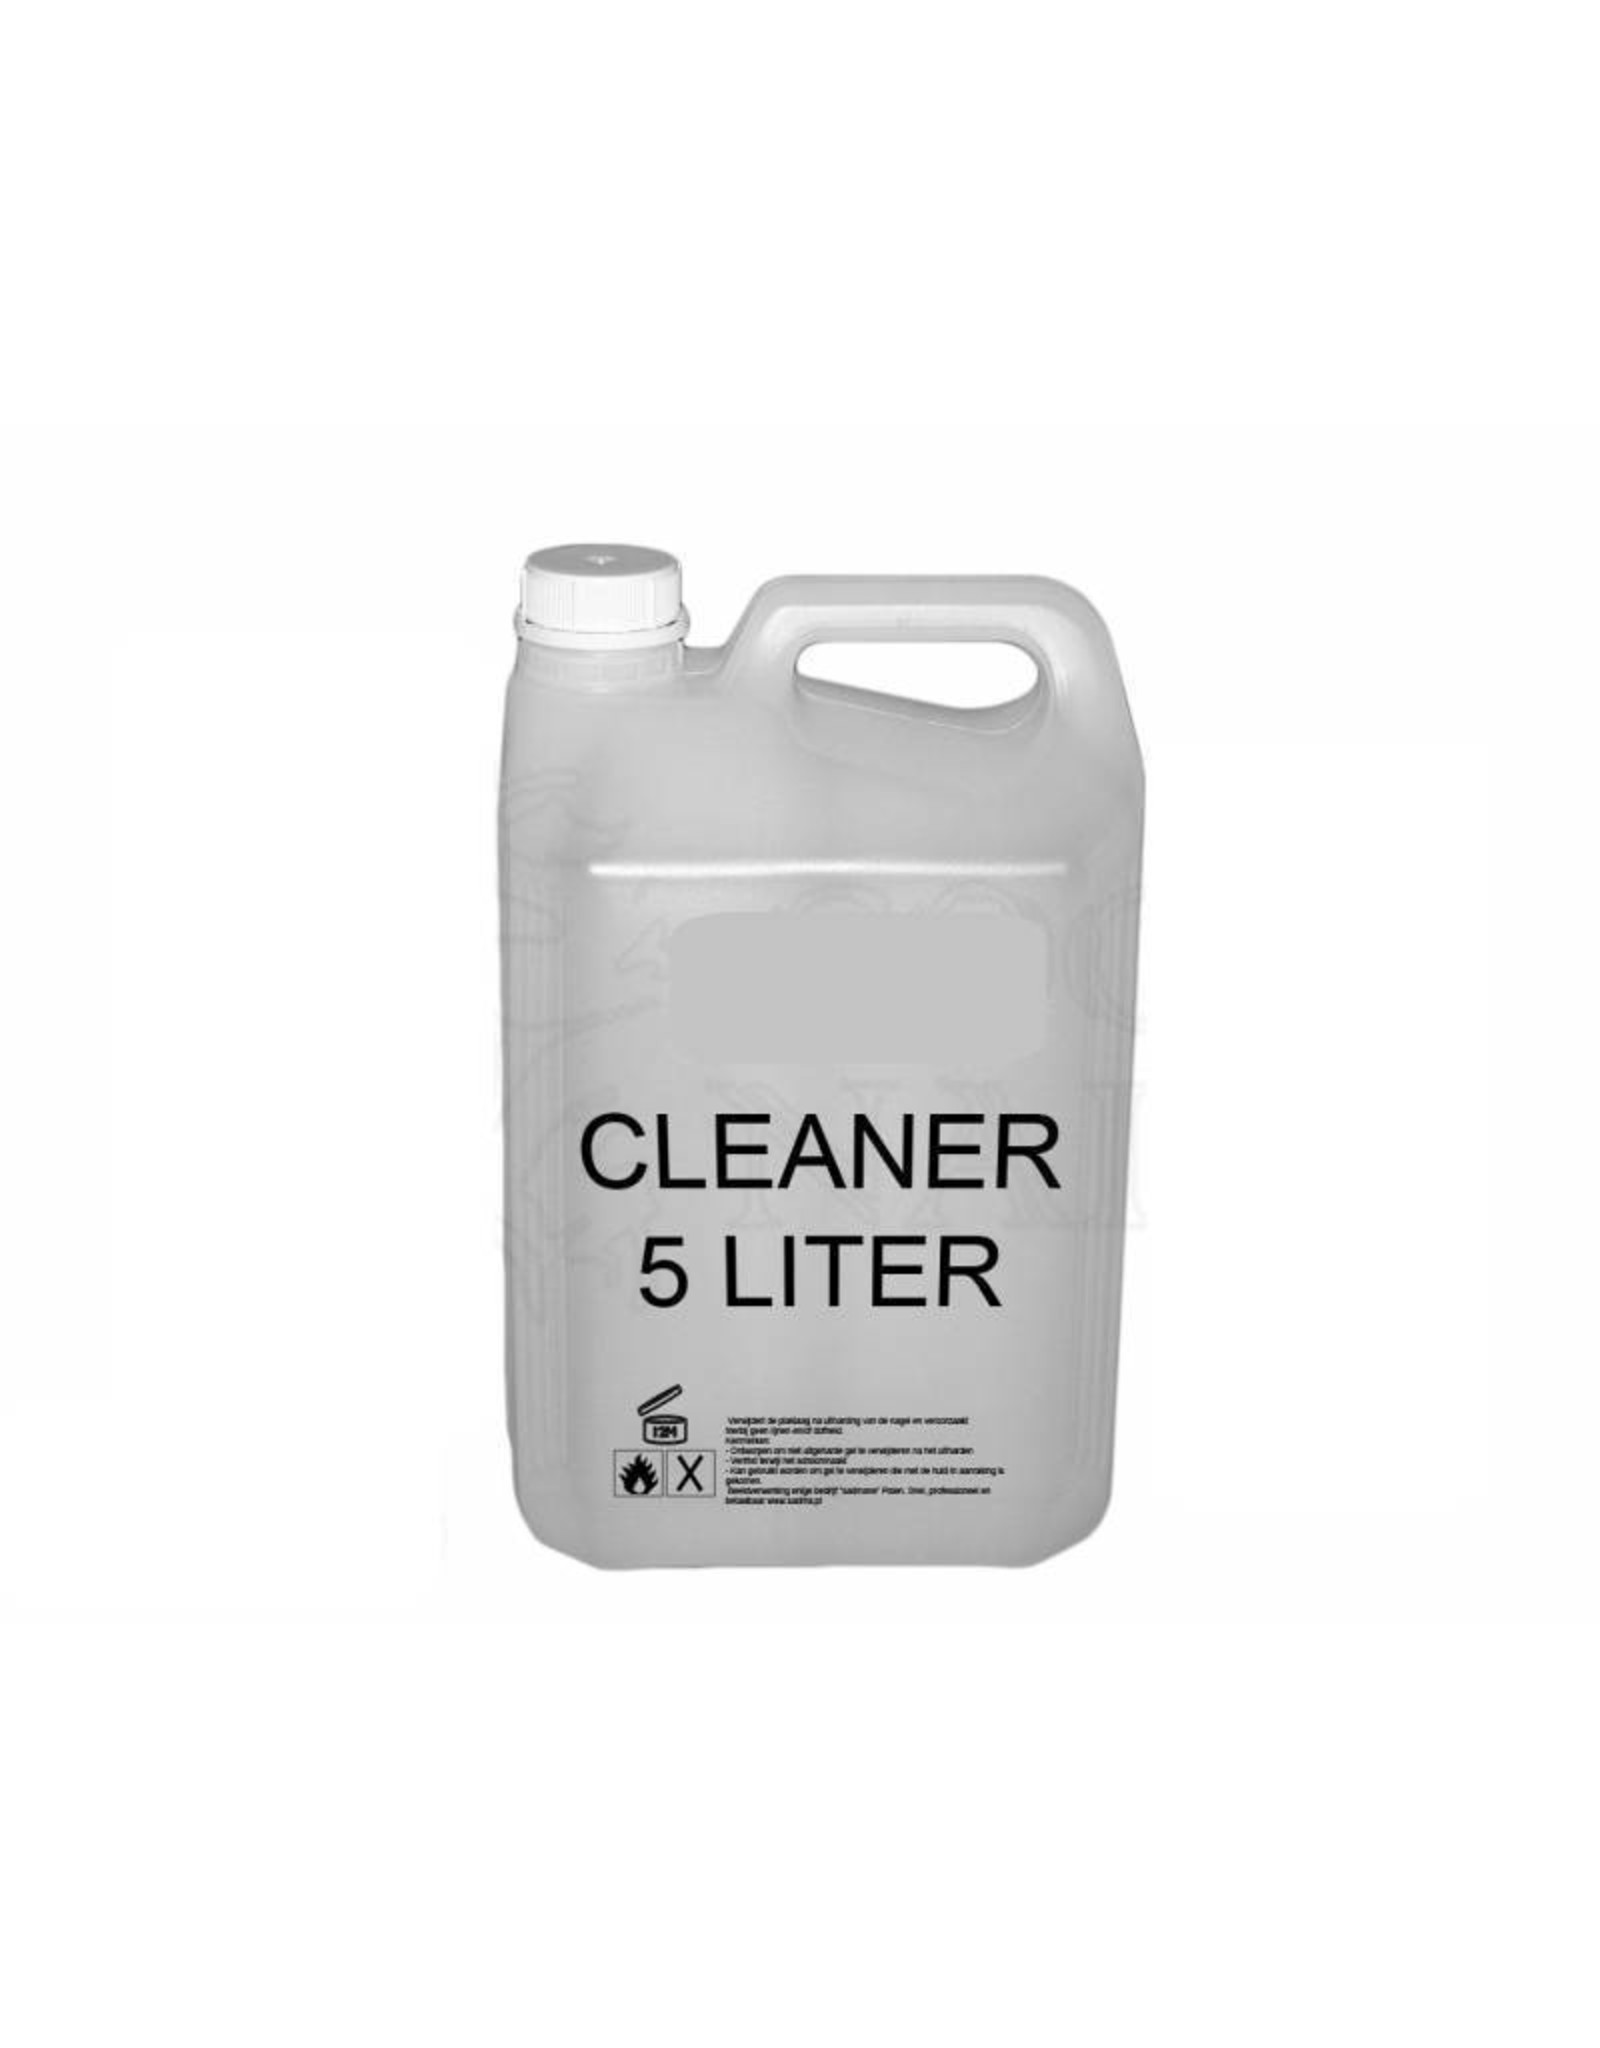 Coconails Cleaner 5 liter